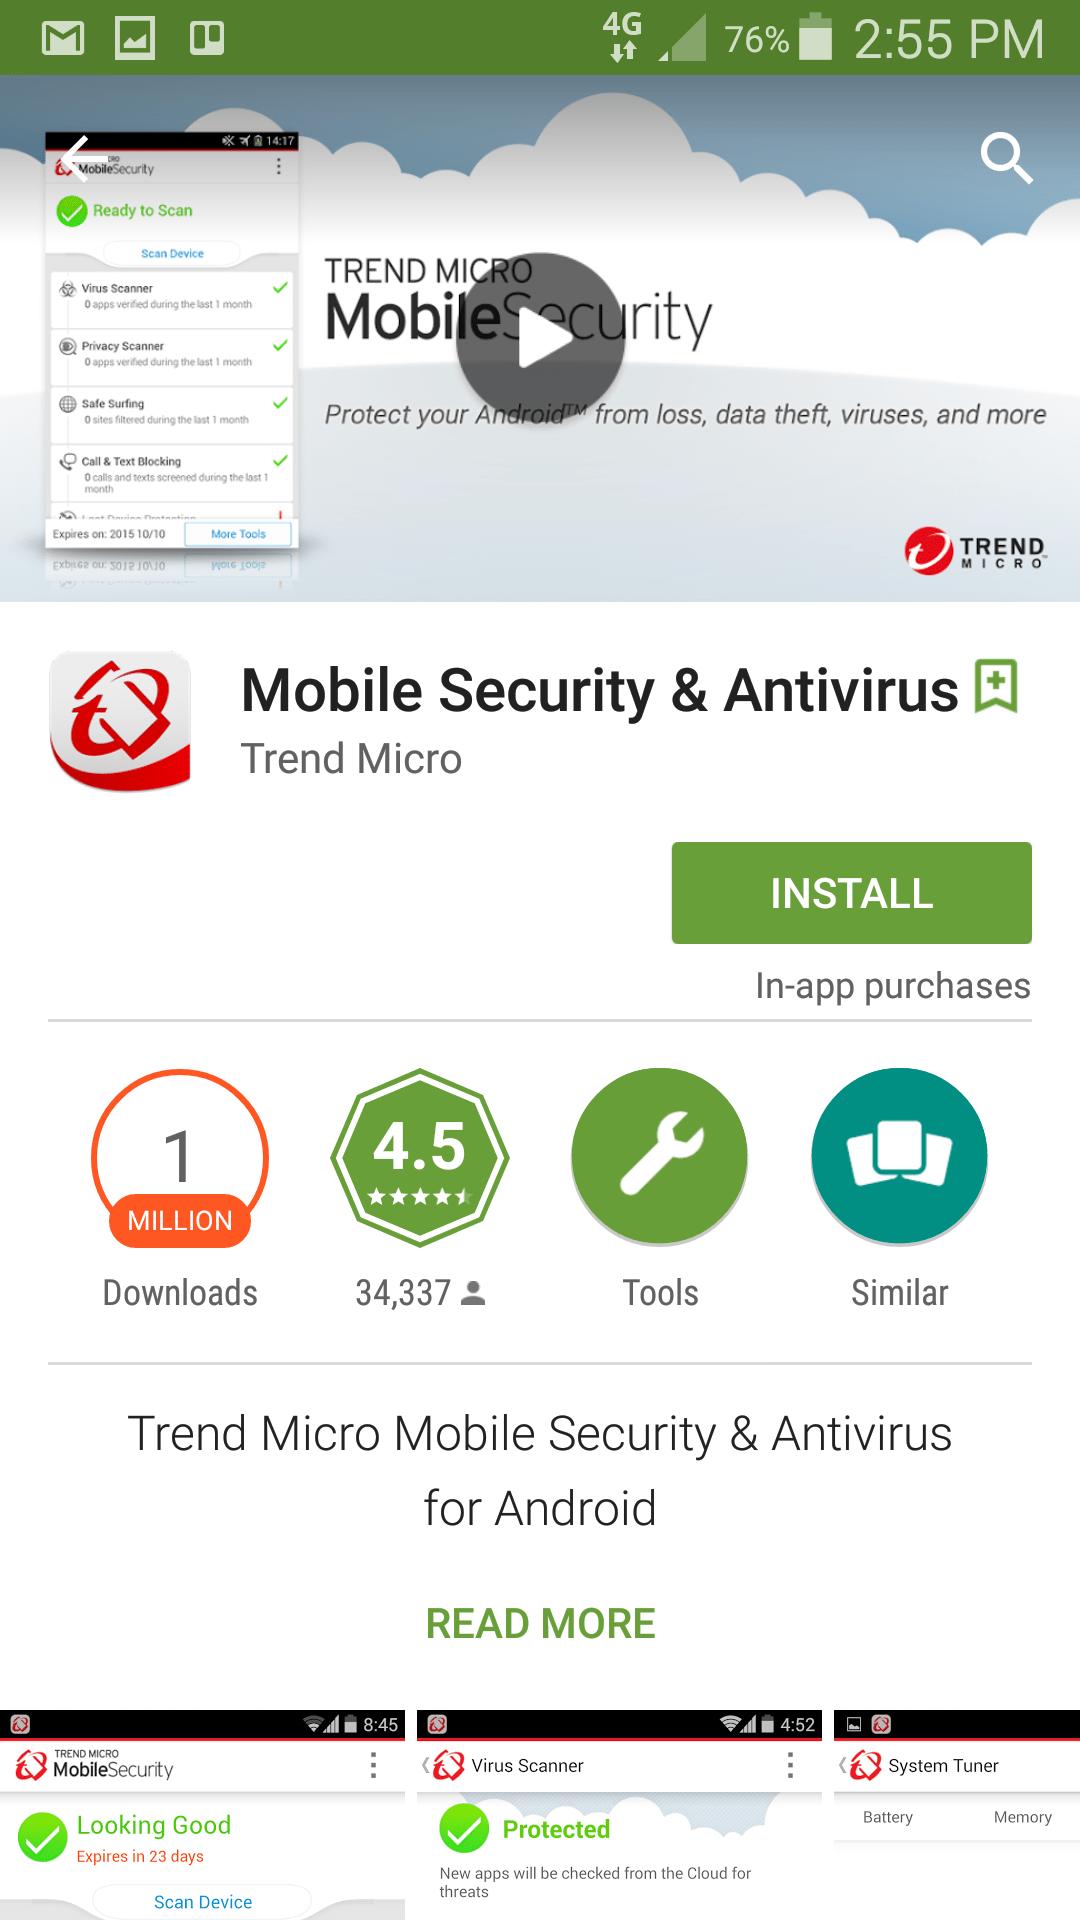 Trend Mobile Security Download App